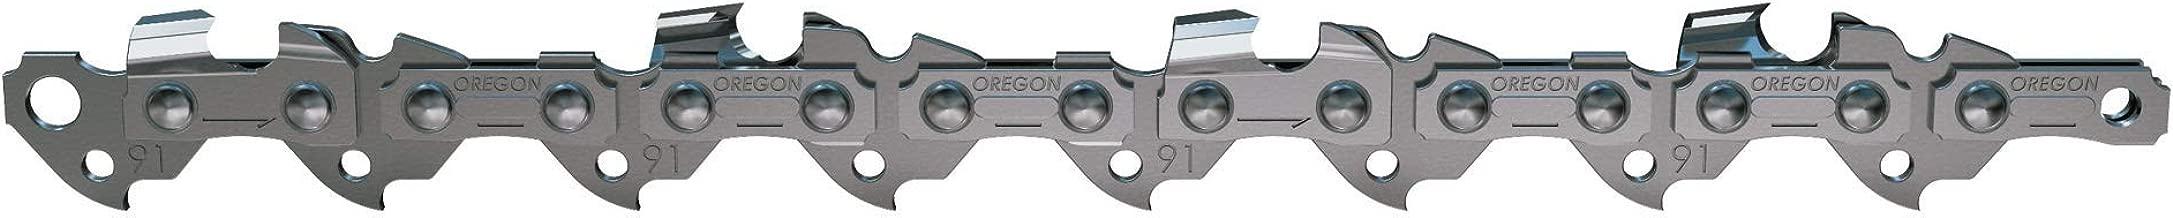 Oregon 91PX050G 50 Drive Link Chamfer Chisel Xtra Guard 3/8-Inch Pitch Low Kickback Saw Chain